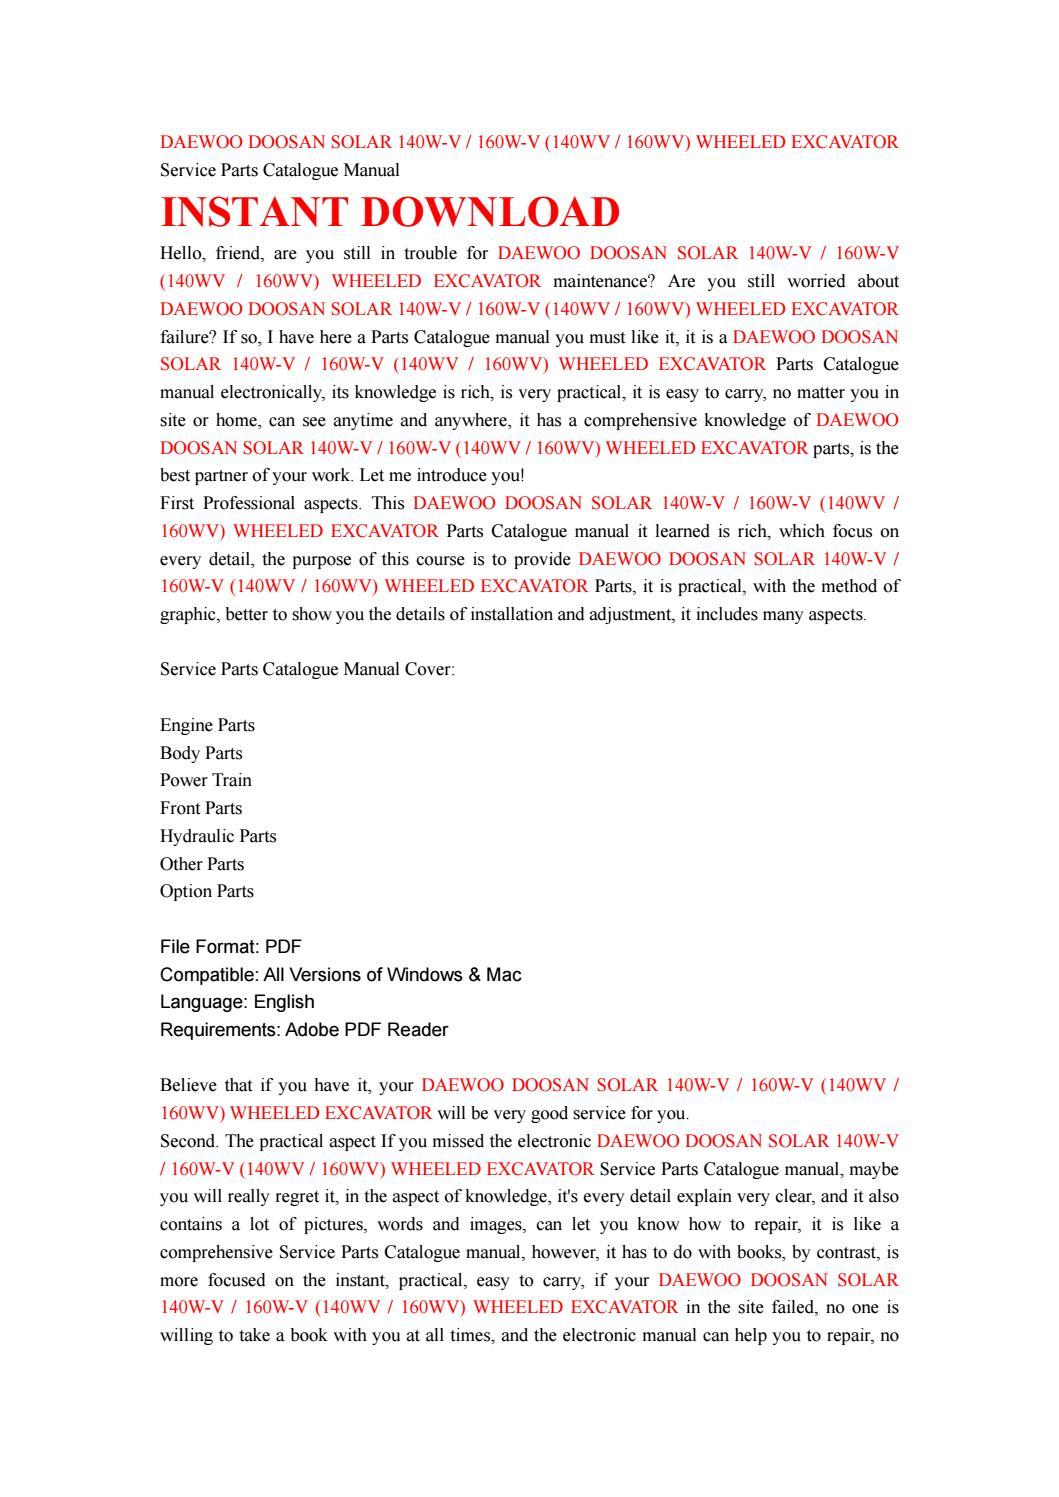 Daewoo doosan solar 140w v 160w v (140wv 160wv) wheeled excavator service  parts catalogue manual by kmsjefnne - issuu